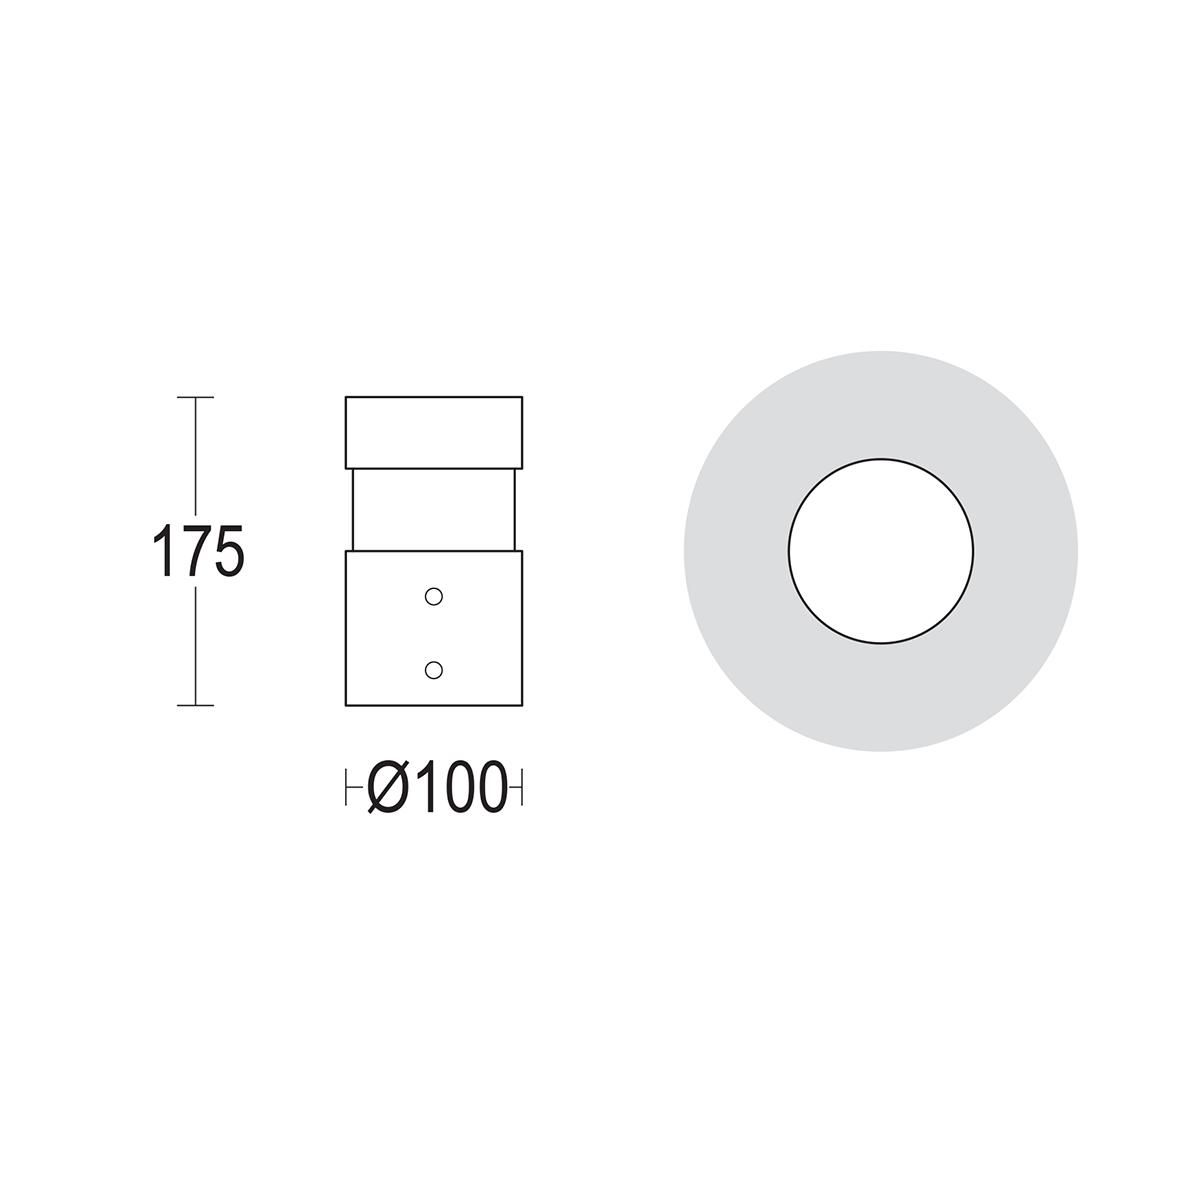 чертеж Tondo 175 Ghidini уличный светильник GH1457.LVXT300EN